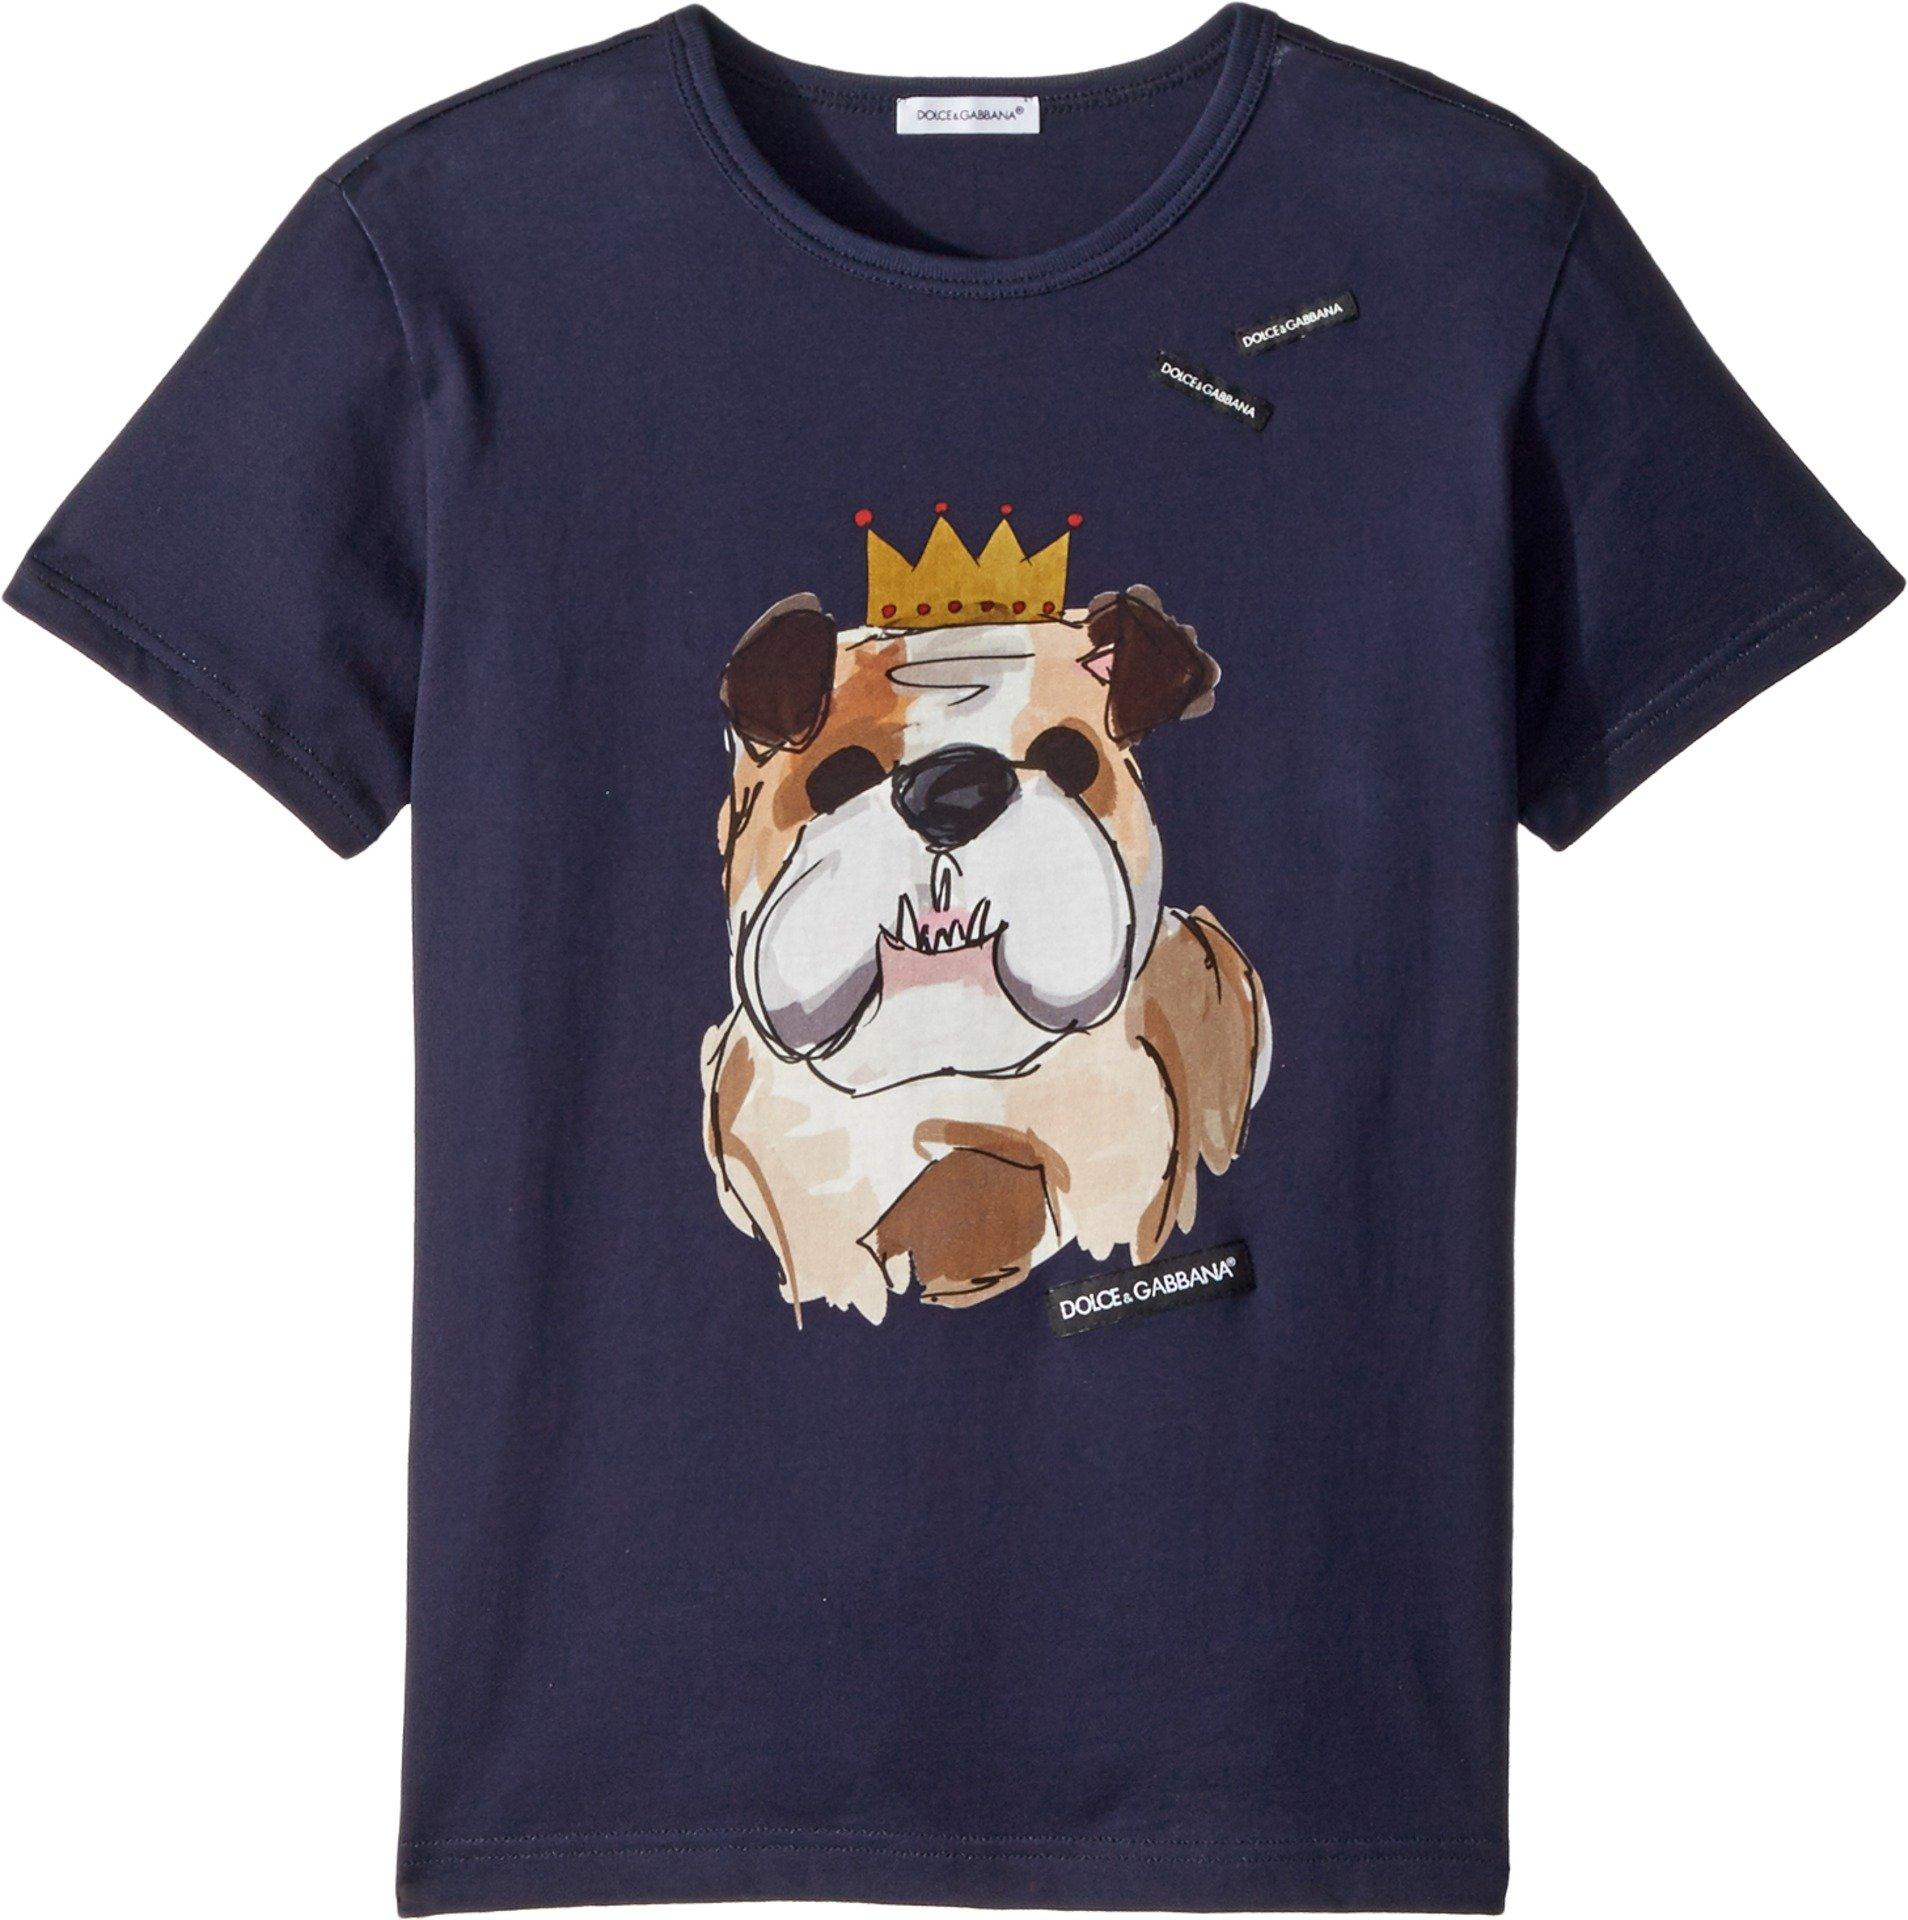 Dolce & Gabbana Kids Boy's T-Shirt (Big Kids) Blue Print 8